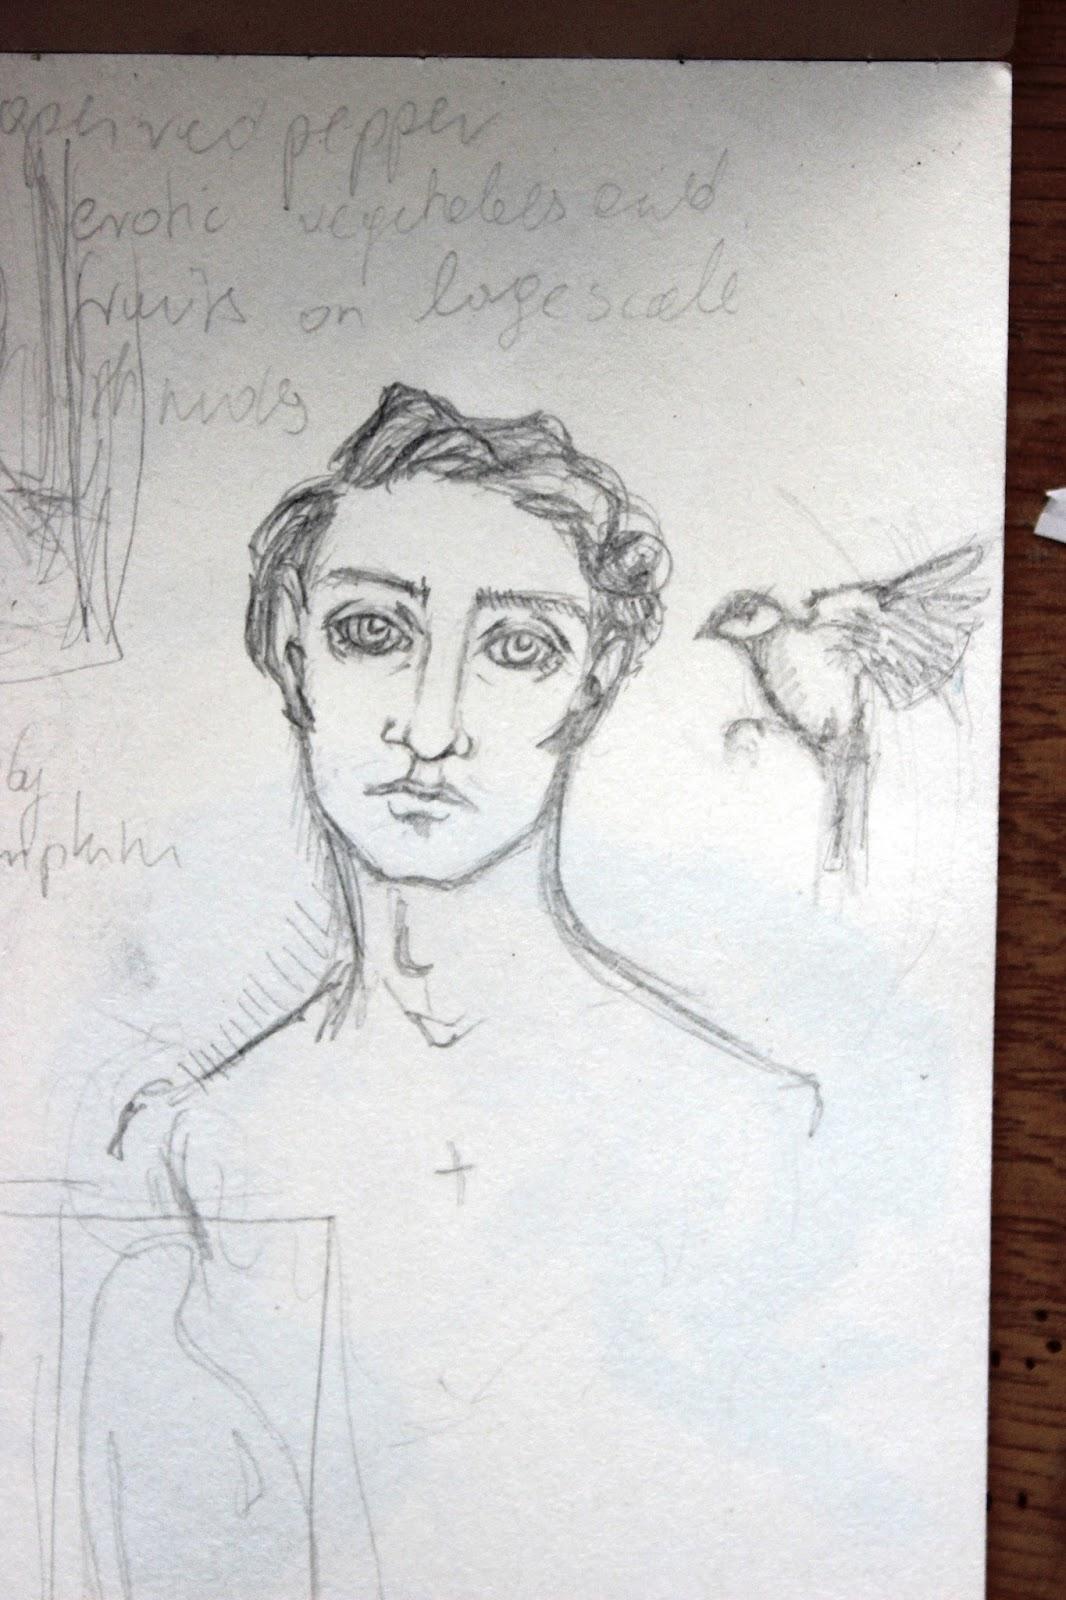 Sketchpad Notebook Sketch Drawing Pencil Portrait Bird